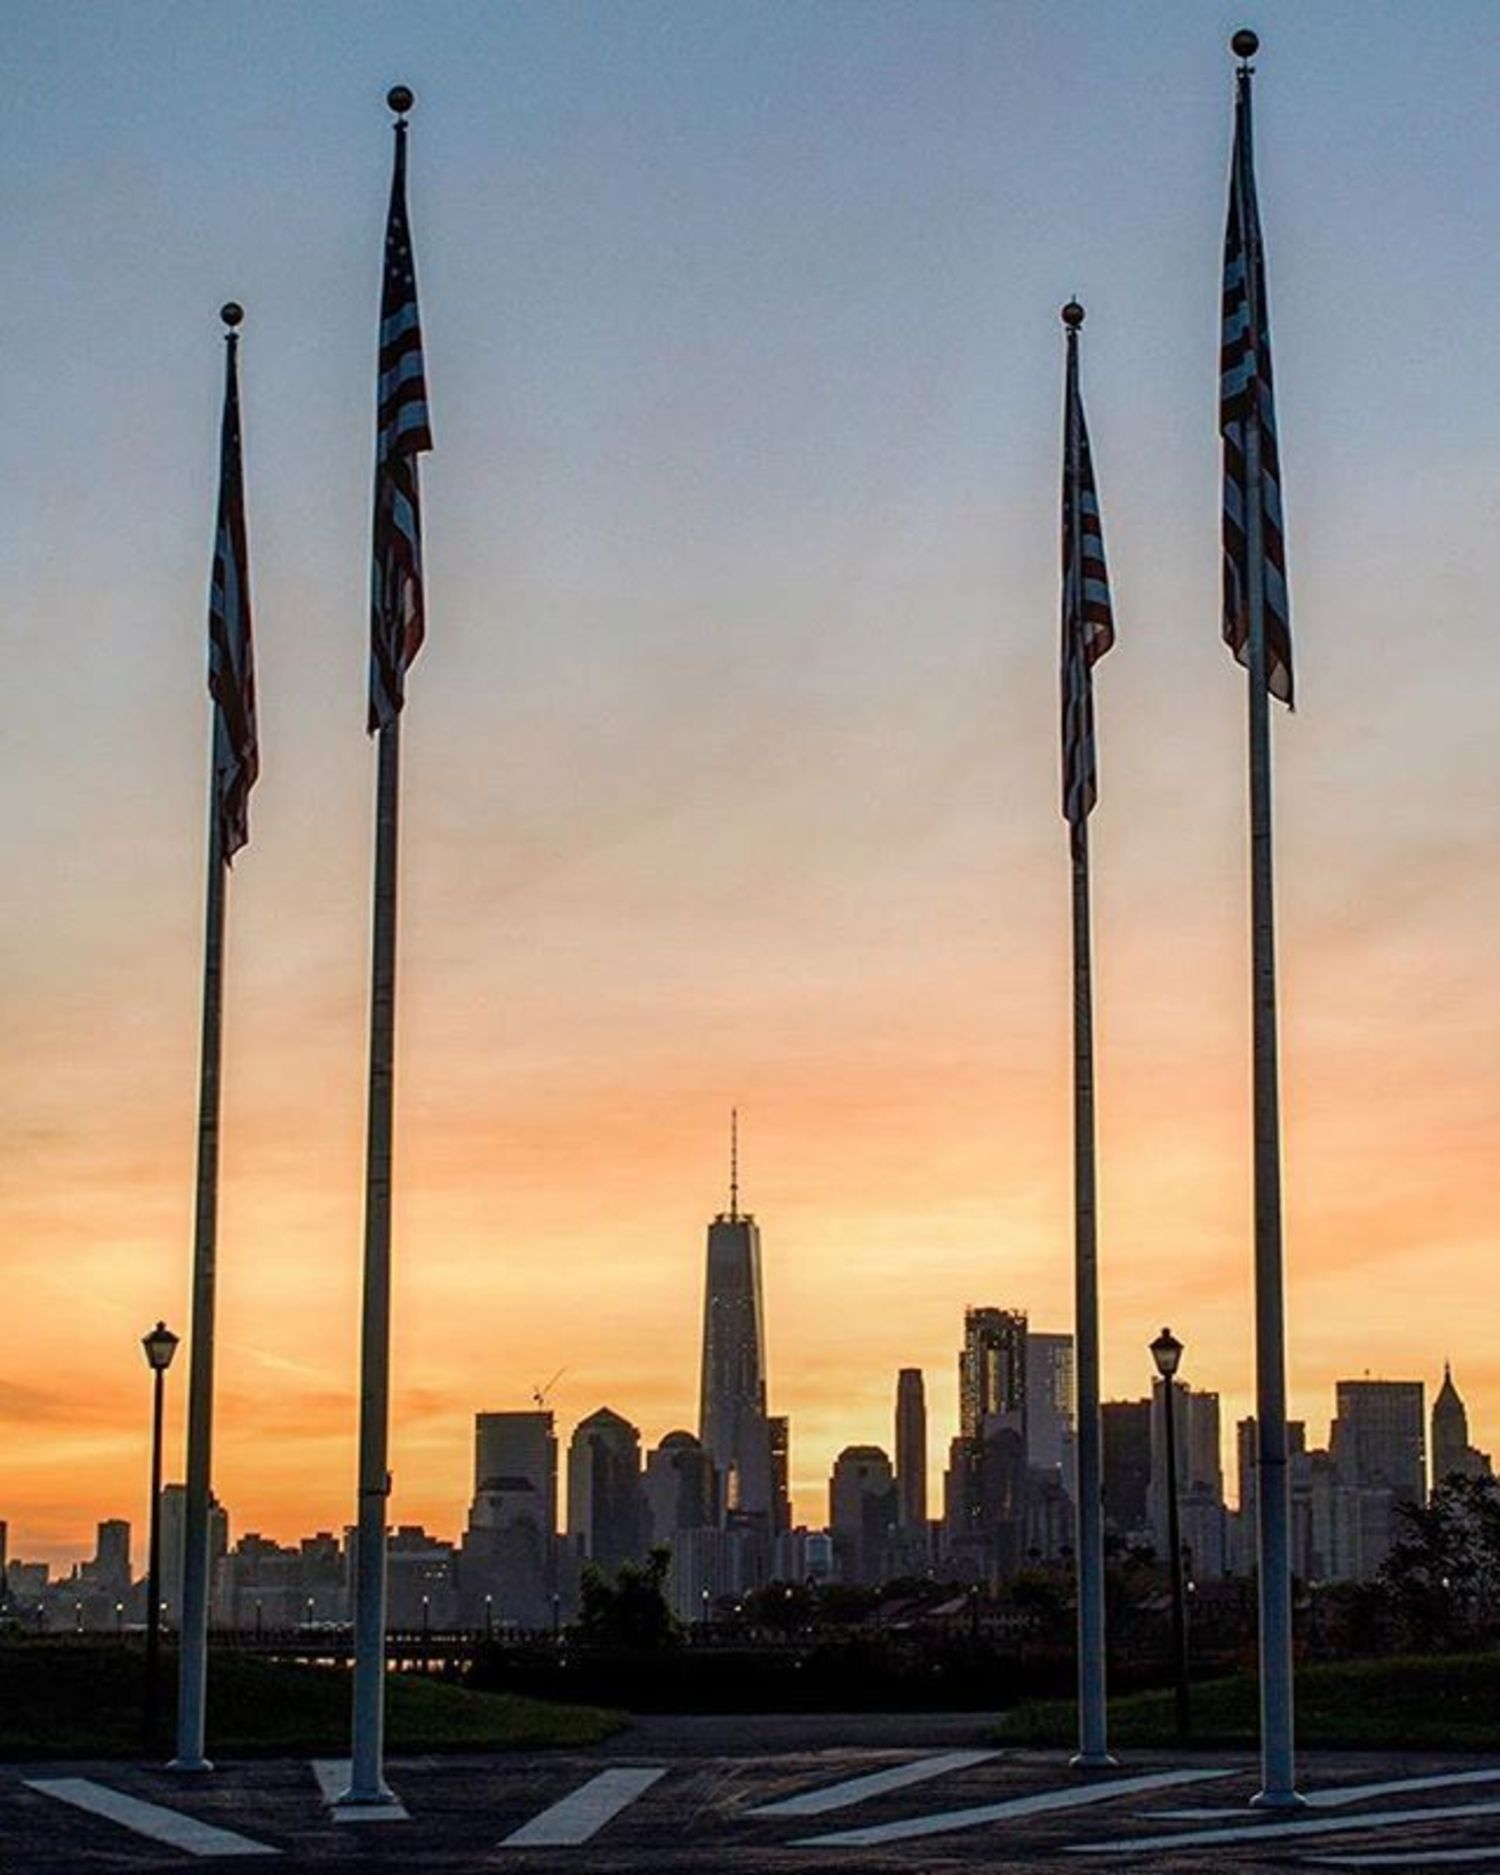 New York, New York. Photo via @montielism #viewingnyc #newyorkcity #newyork